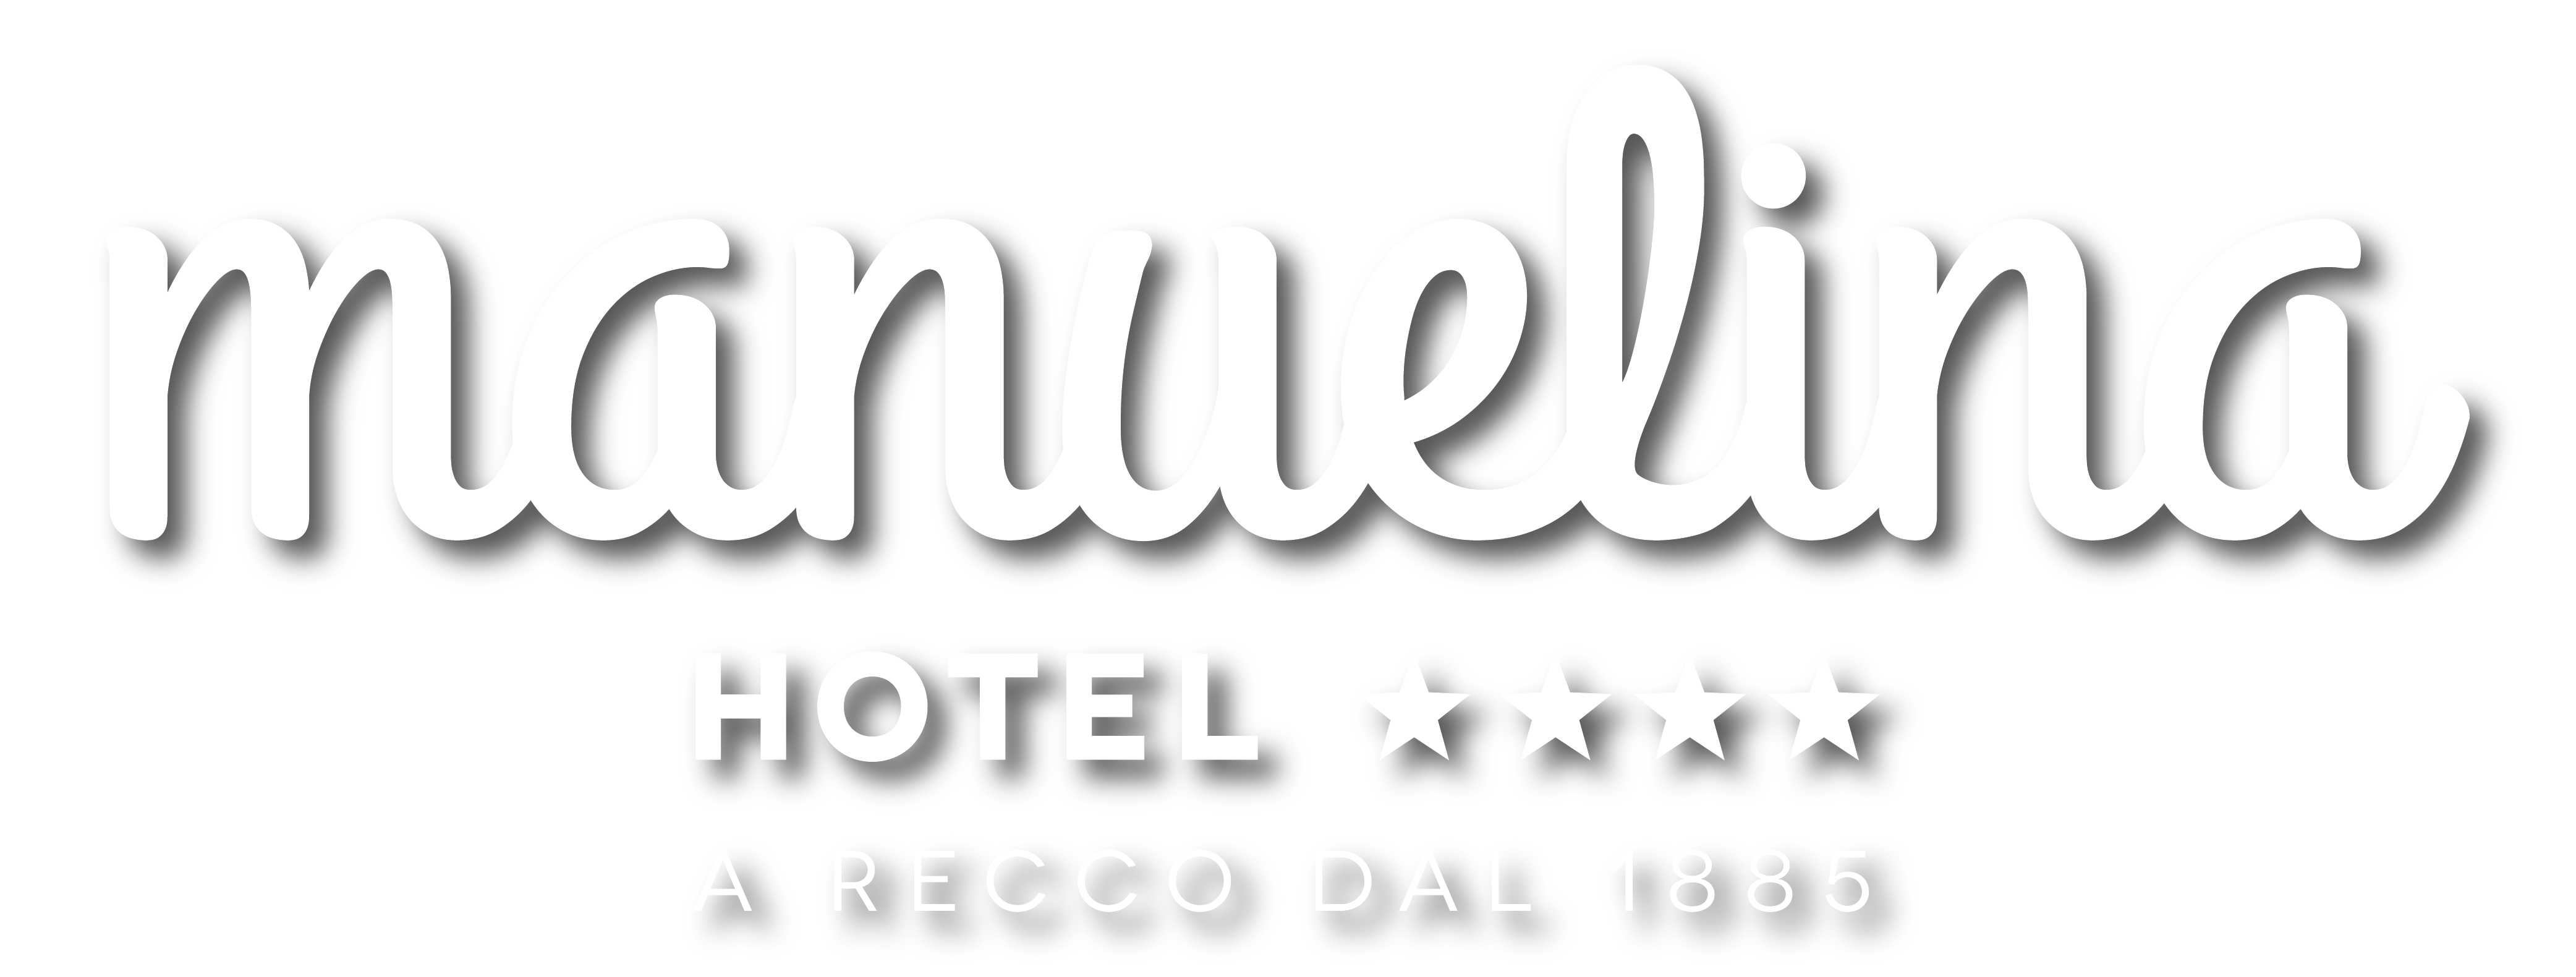 Manuelina_Hotel_Tavola disegno 1